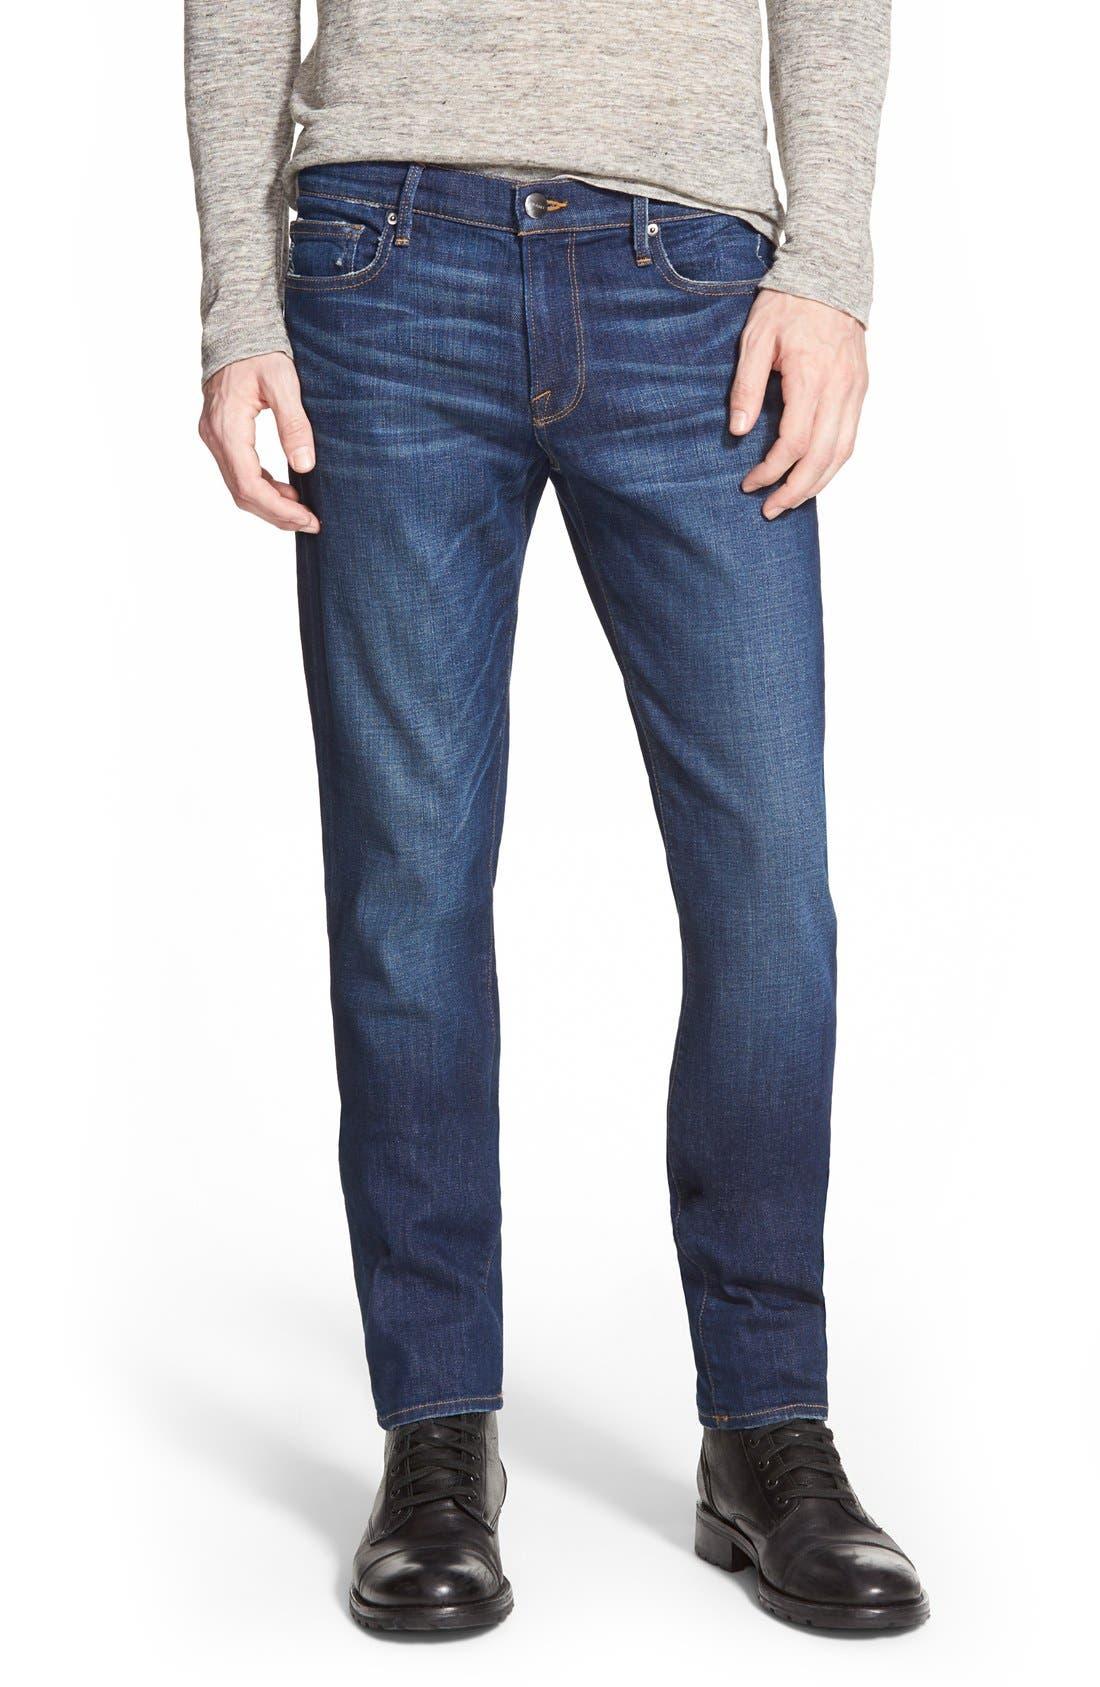 Alternate Image 1 Selected - FRAME L'Homme Slim Fit Jeans (Niagra)